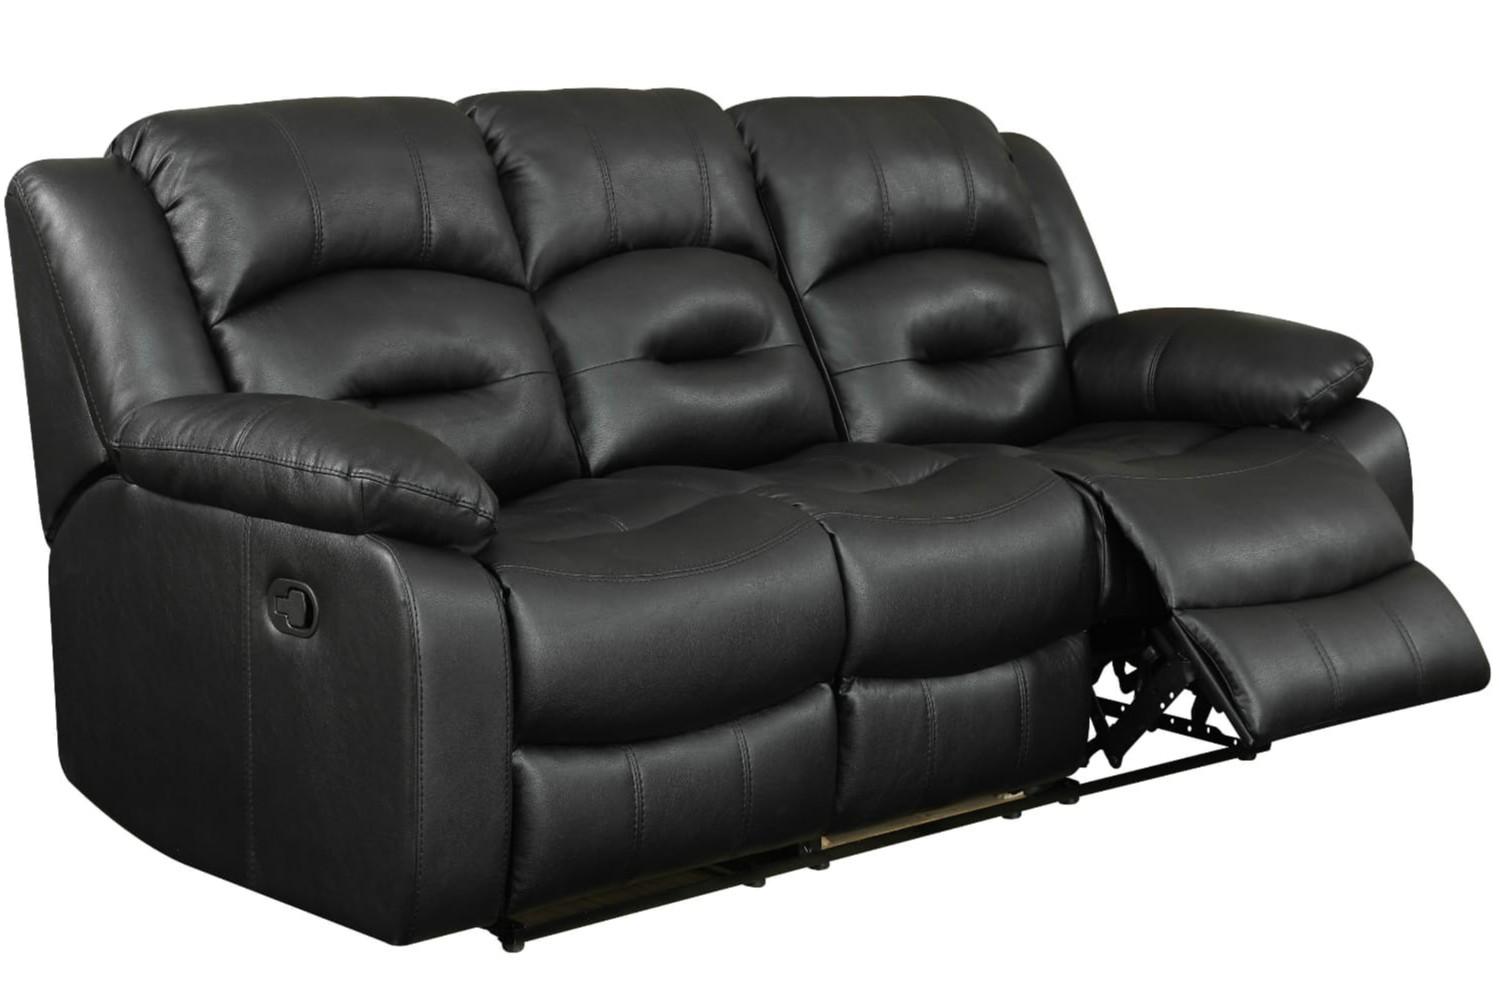 3 seater sofa black leather cama chaise longue modular hunter recliner harvey norman sofas ireland